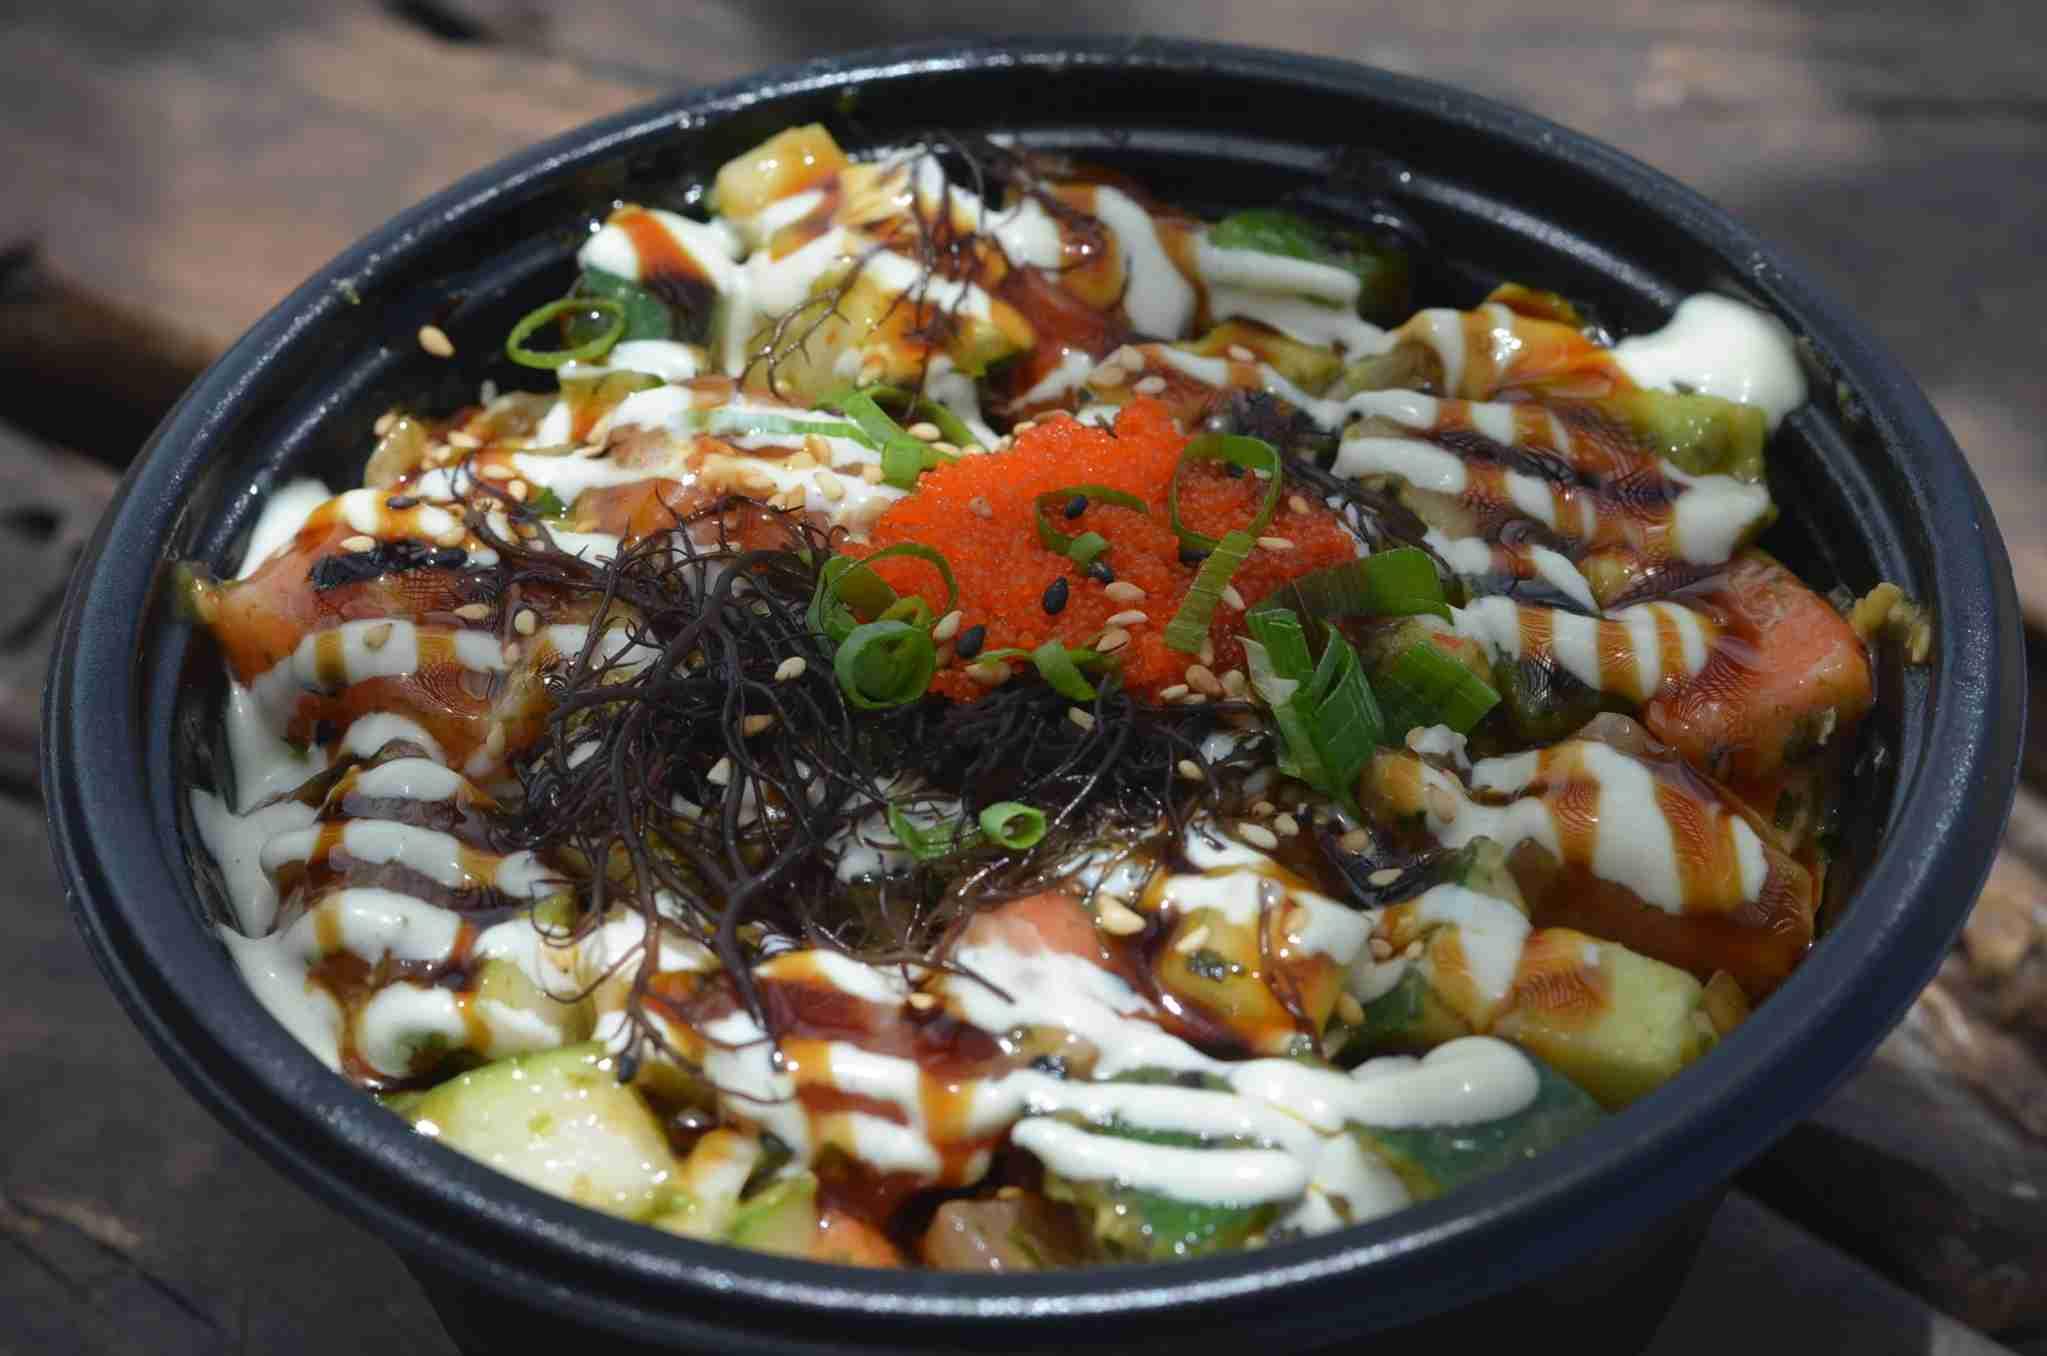 The Gorilla poke bowl by Makai Sushi.